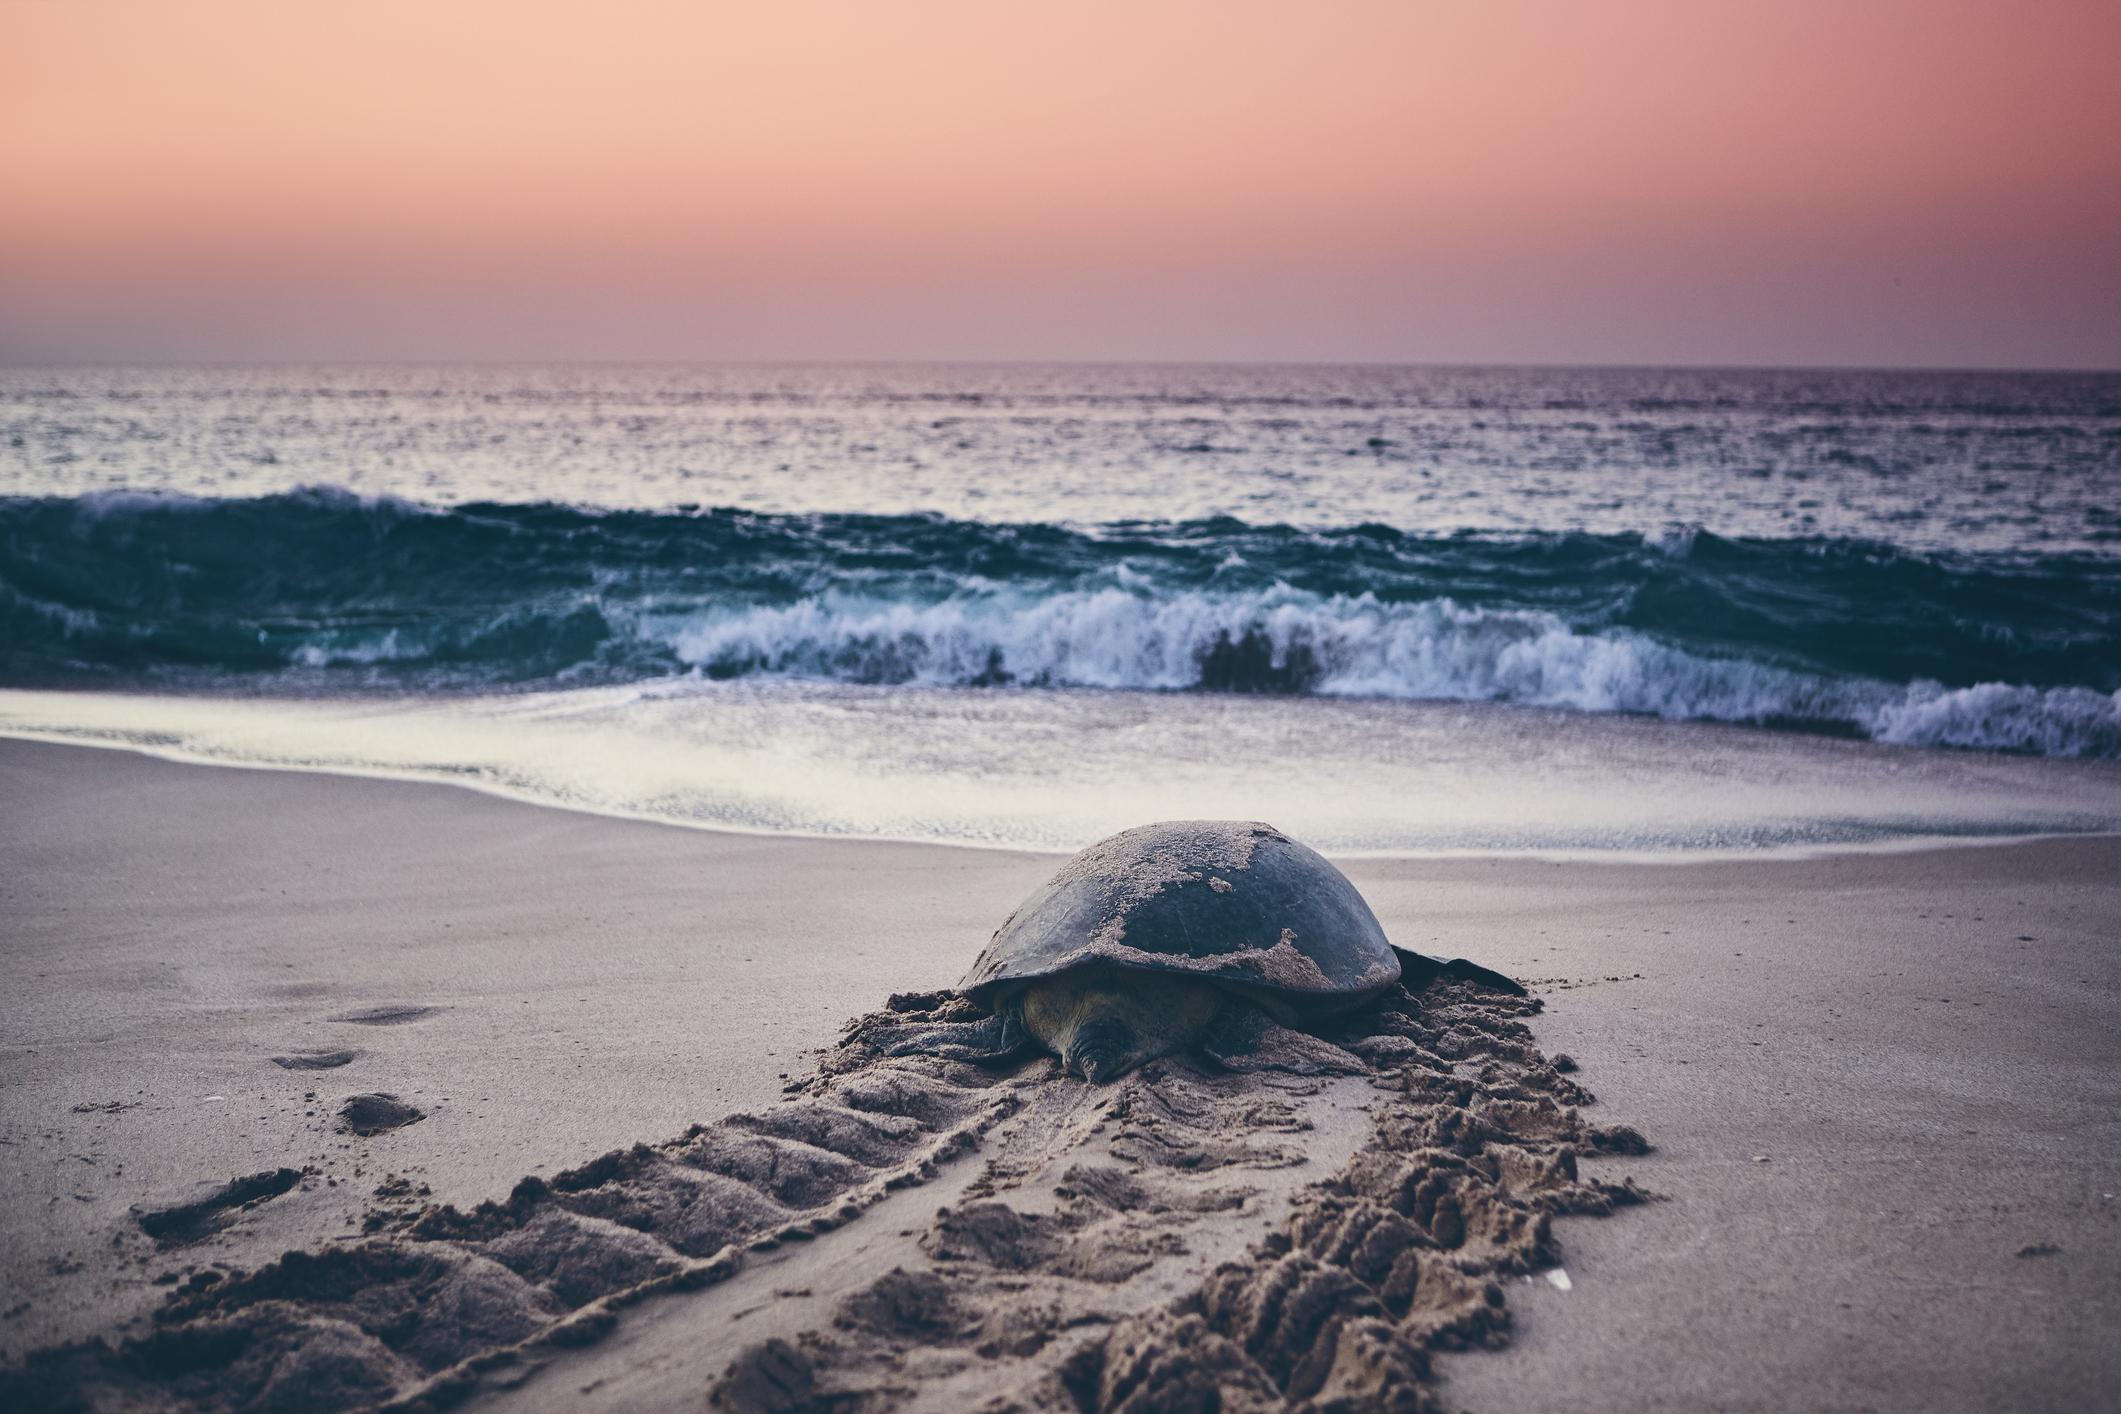 sea turtles in oak island nc